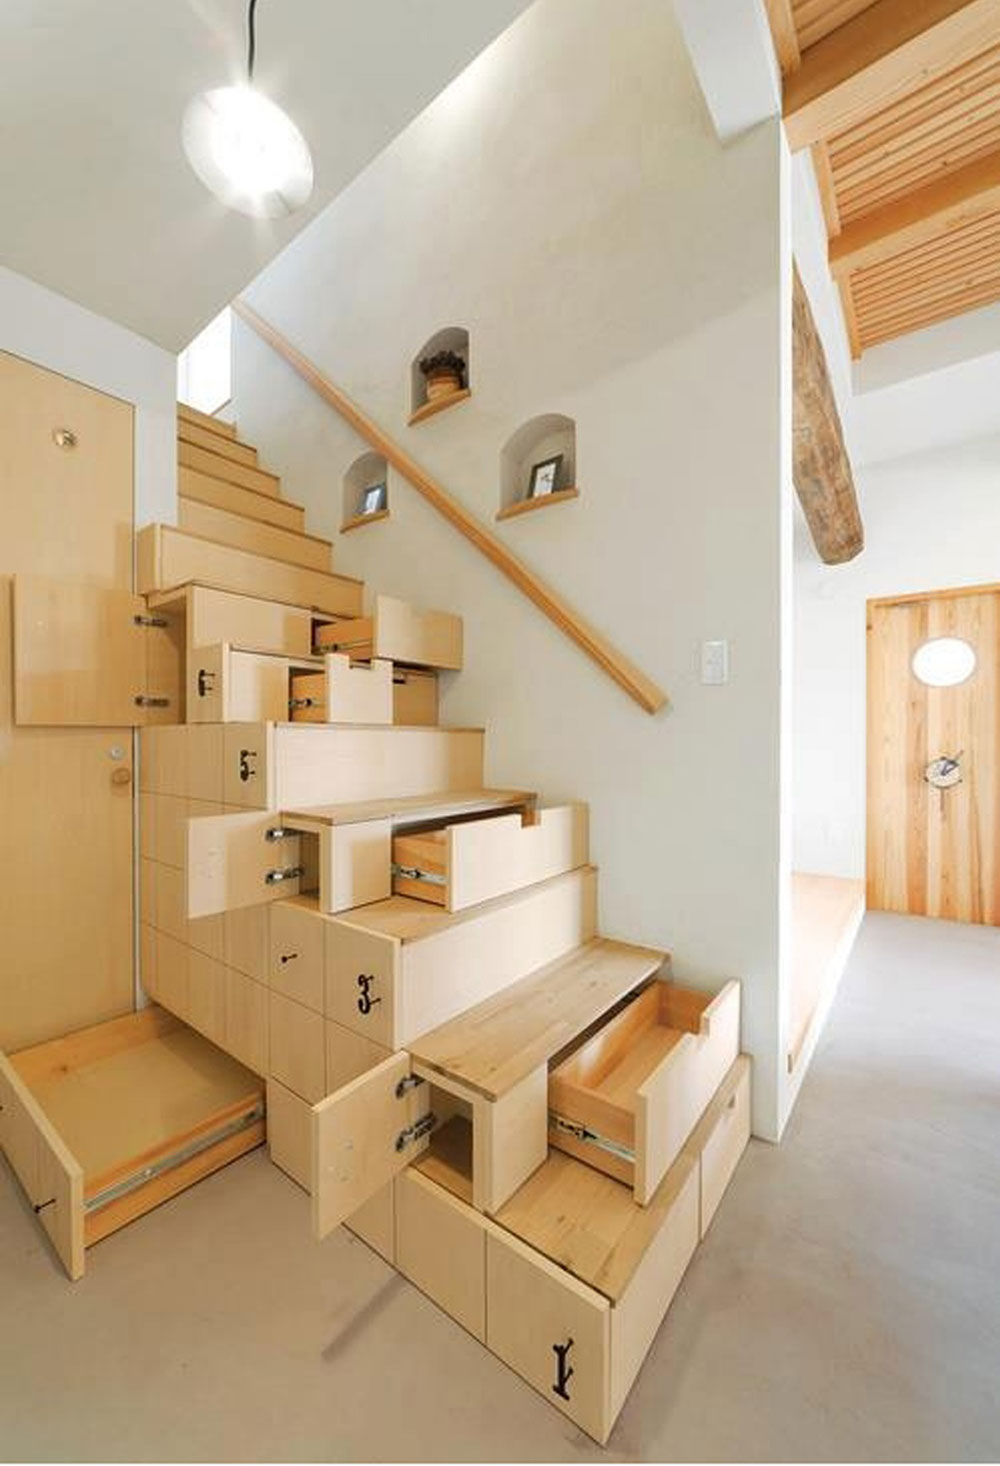 espace furniture spacesavingfurnitureideasforsmallrooms16 space saving furniture ideas for small rooms